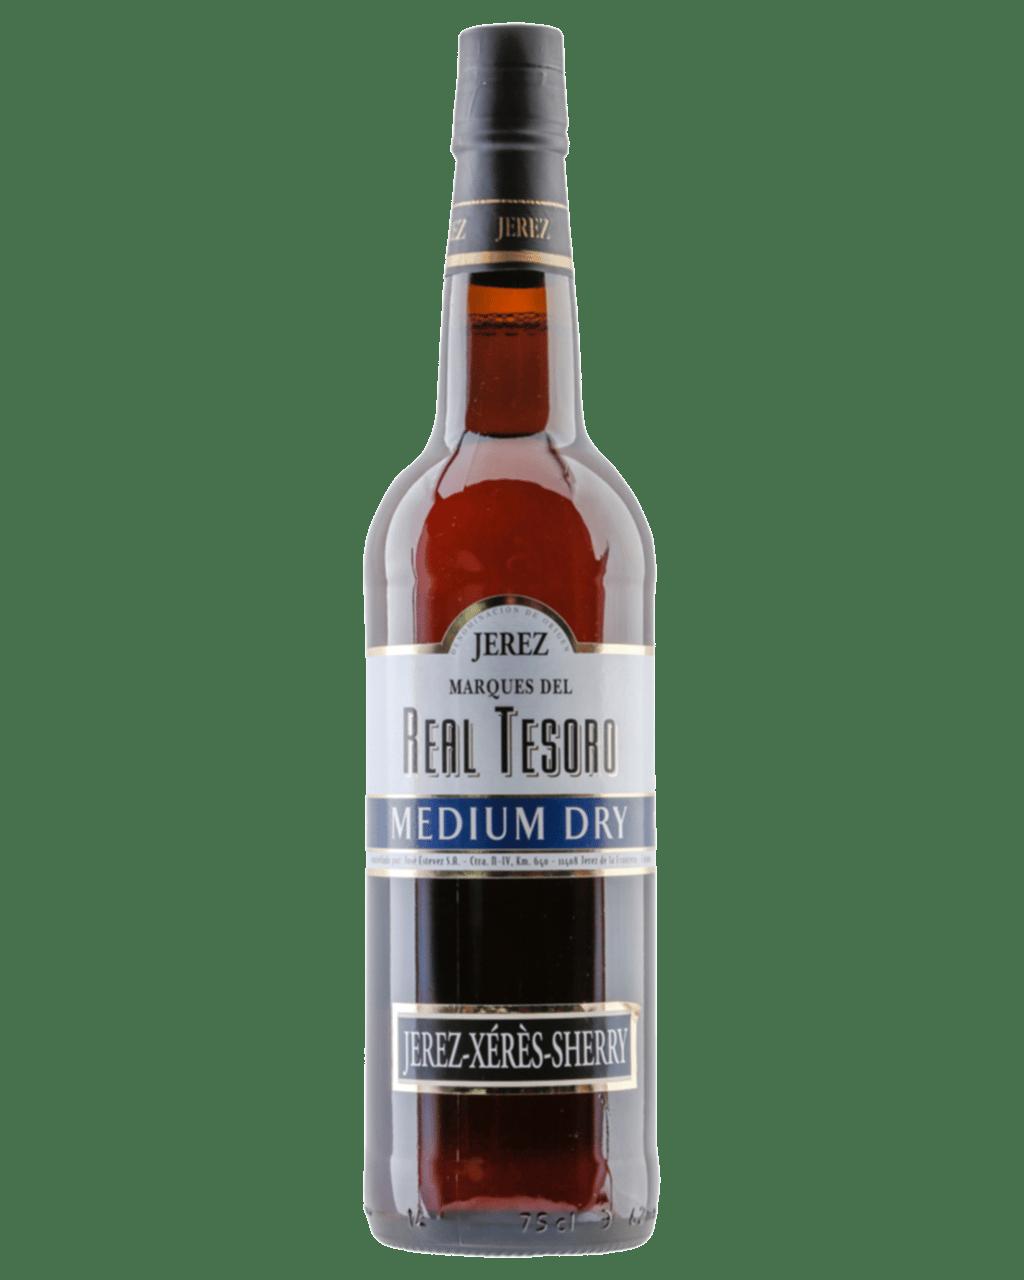 Jerez Real Tesoro Medium Dry Sherry Dan Murphys Buy Wine Palomino Tinela Handbag Mud Champagne Beer Spirits Online